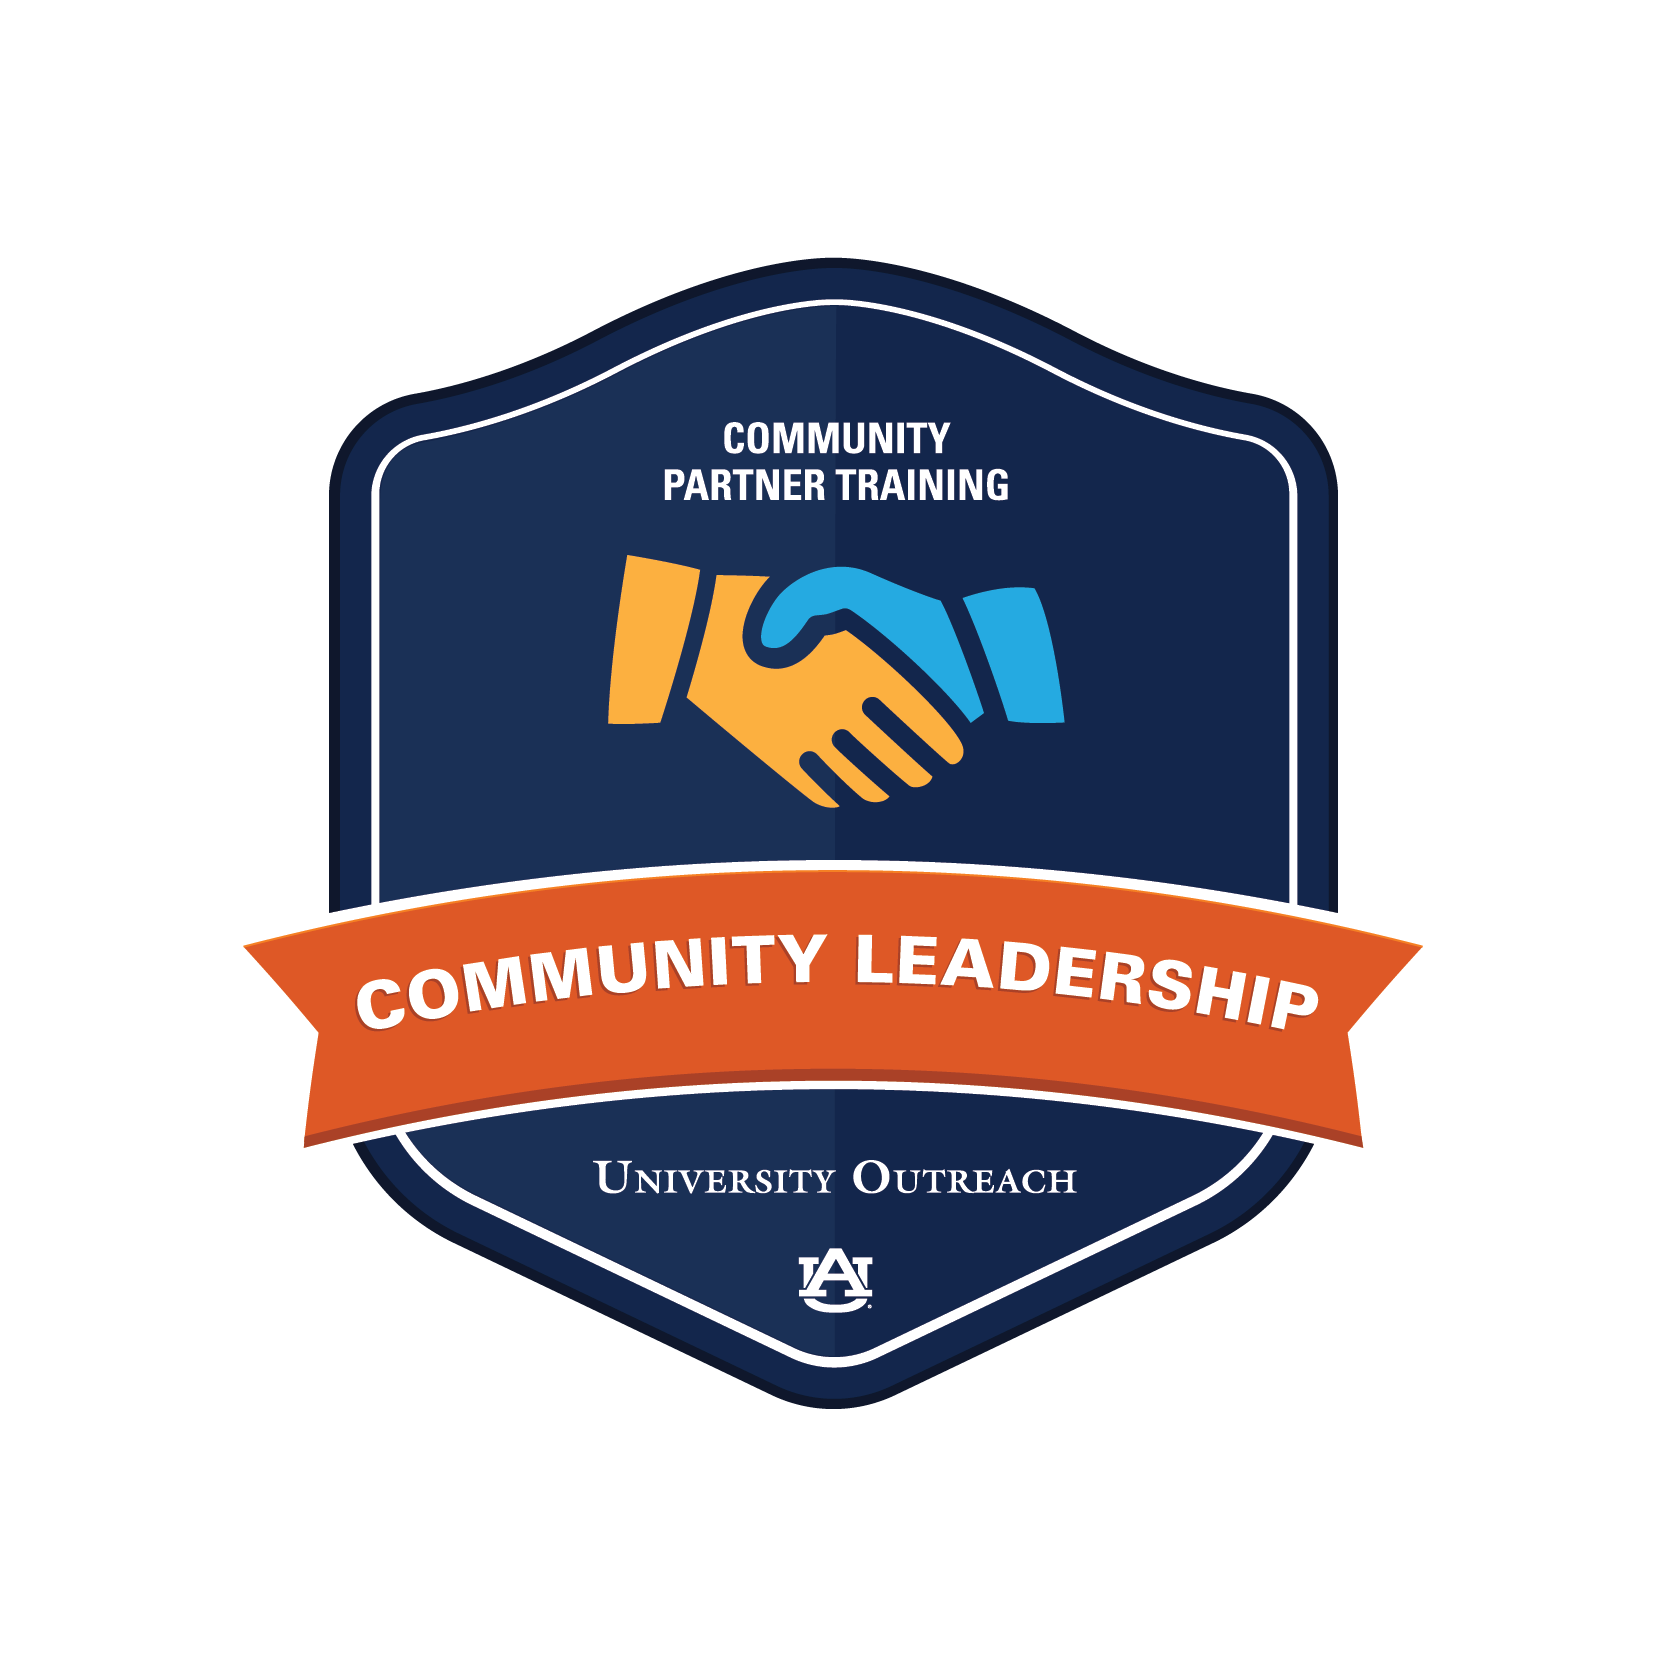 Community Partner Training Badge 1: Community Leadership for a Changing Economy